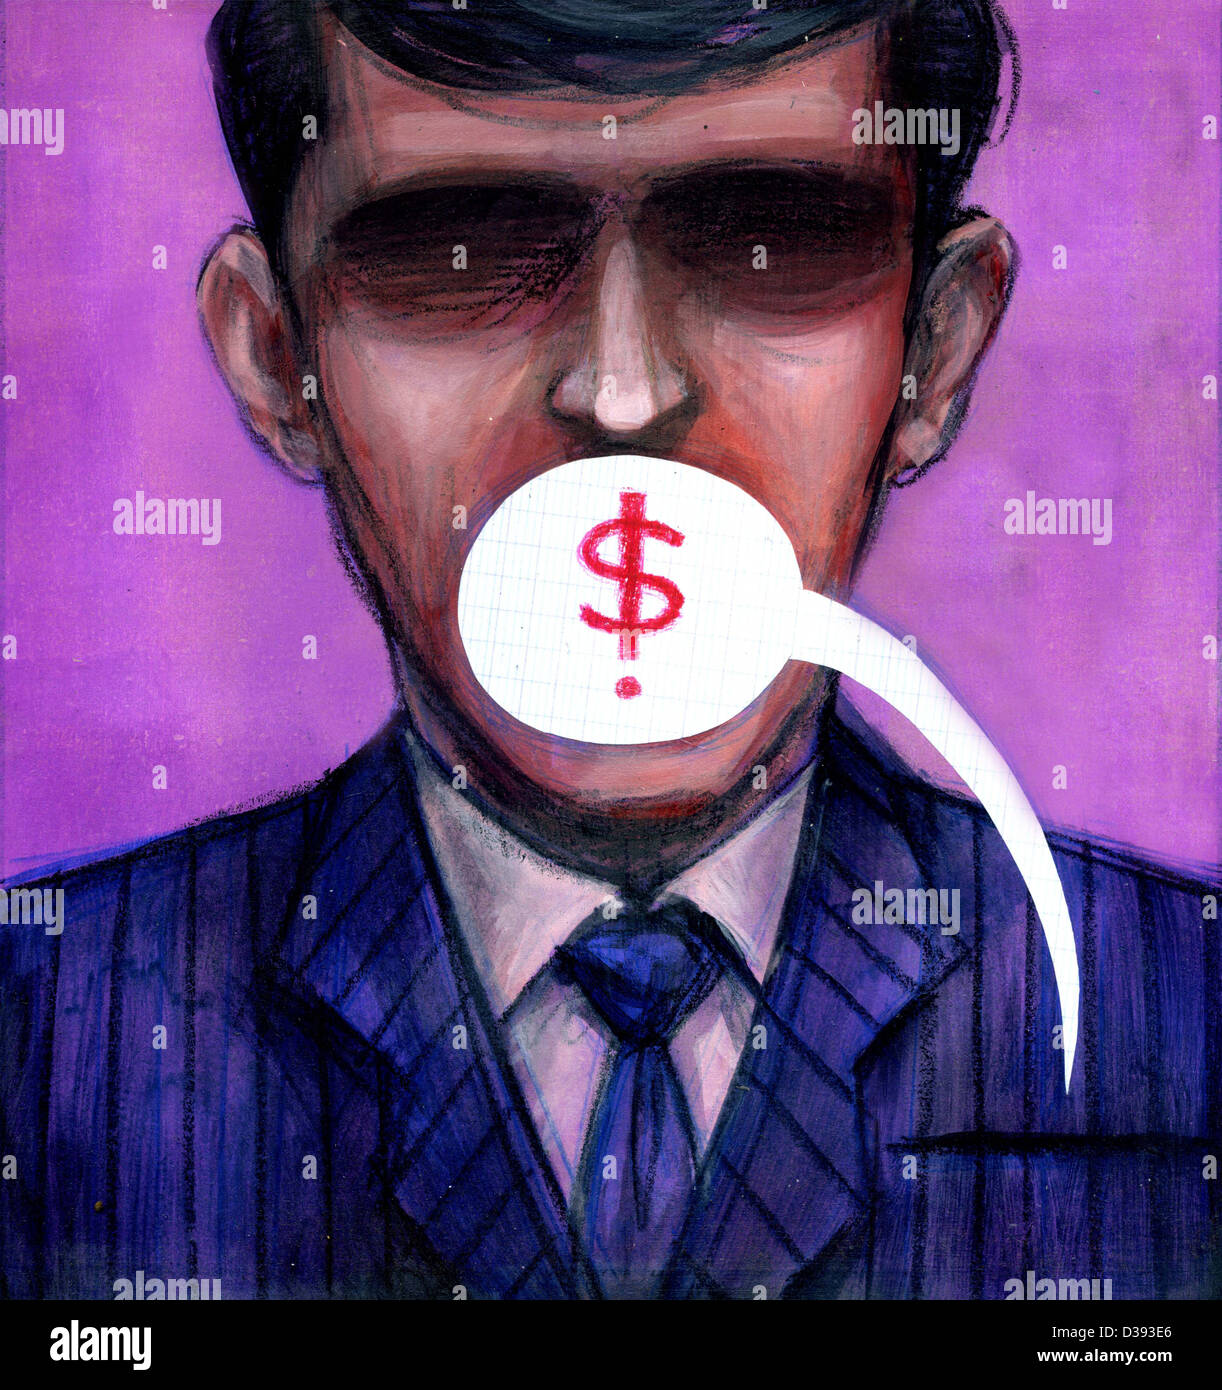 Hablar de dinero Imagen De Stock